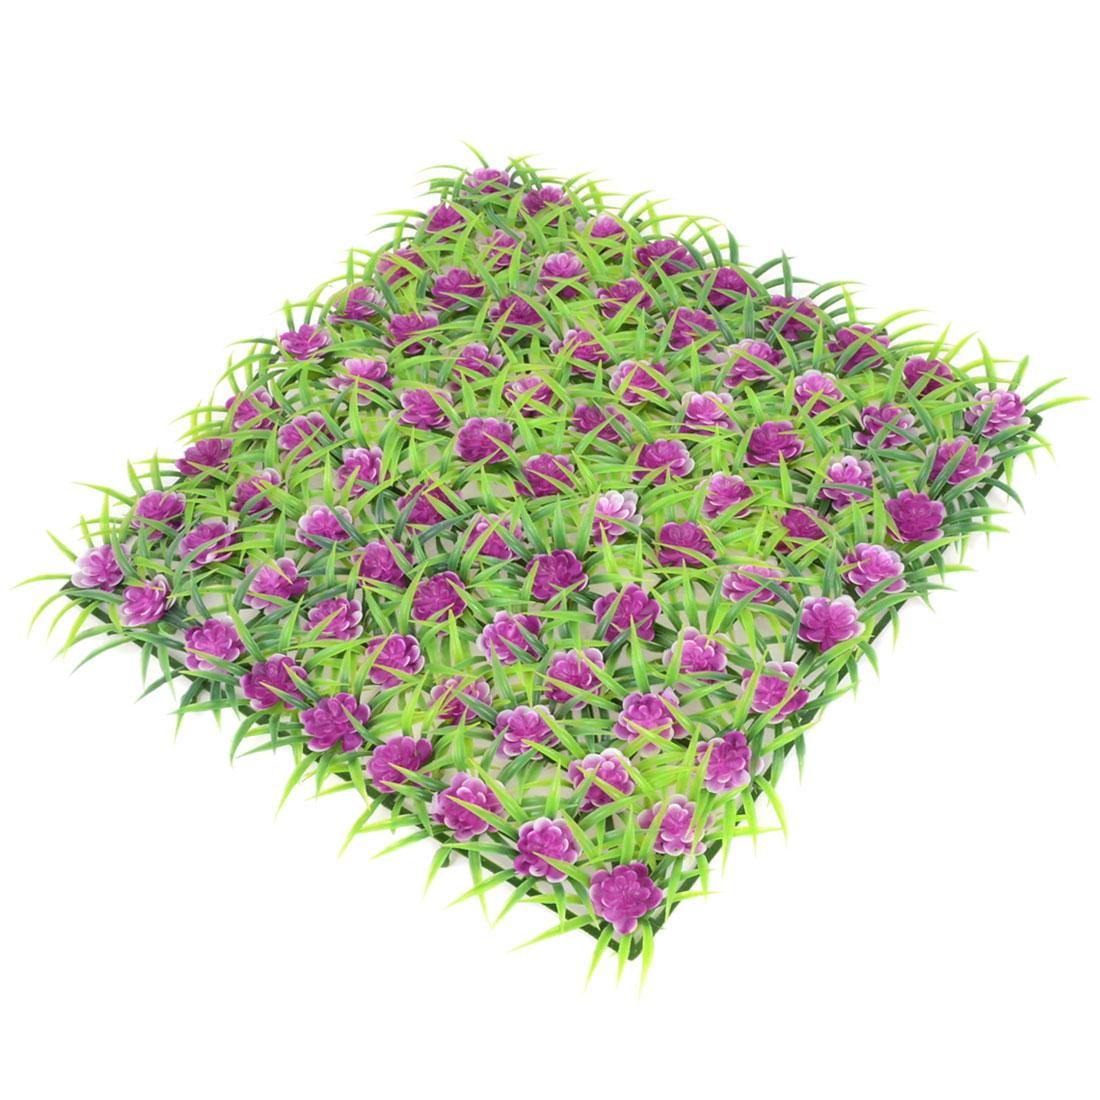 Purple Green Plastic Emulation Underwater Plant Grass Flower 22x22cm for Fish Tank